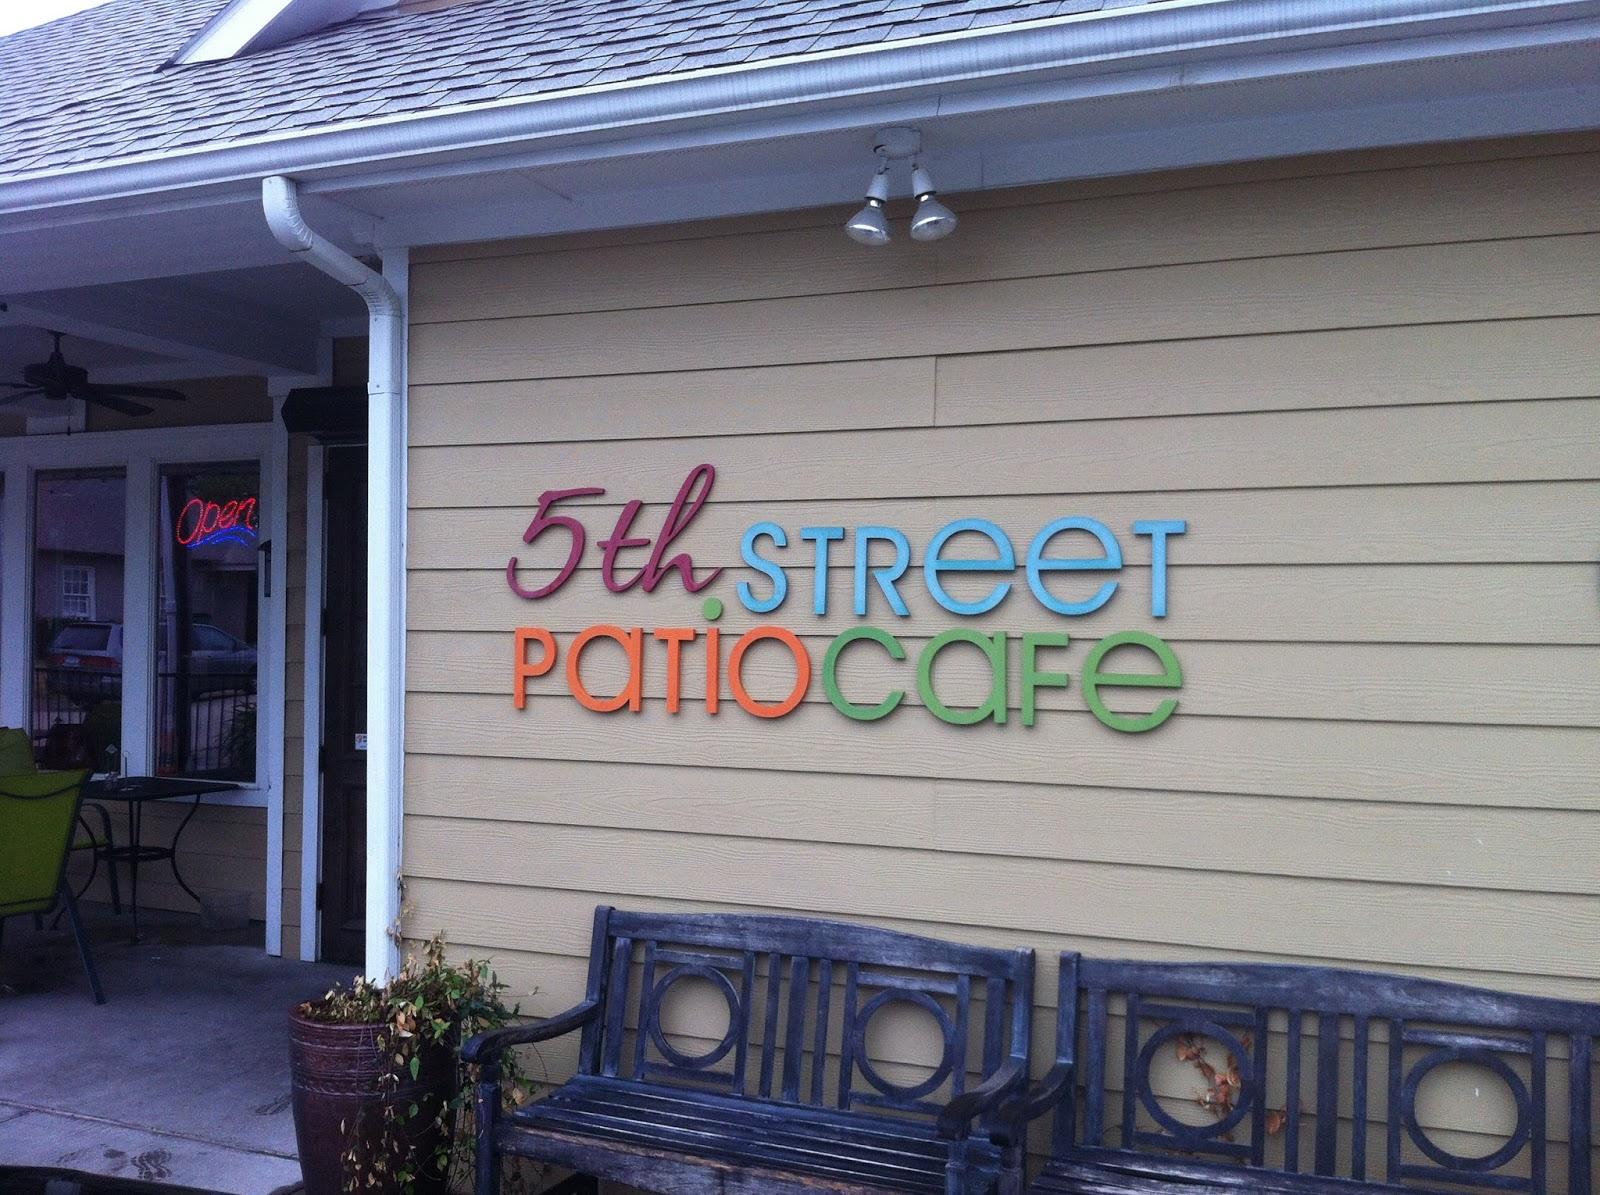 Livin The Good Life: 5th Street Patio Cafe